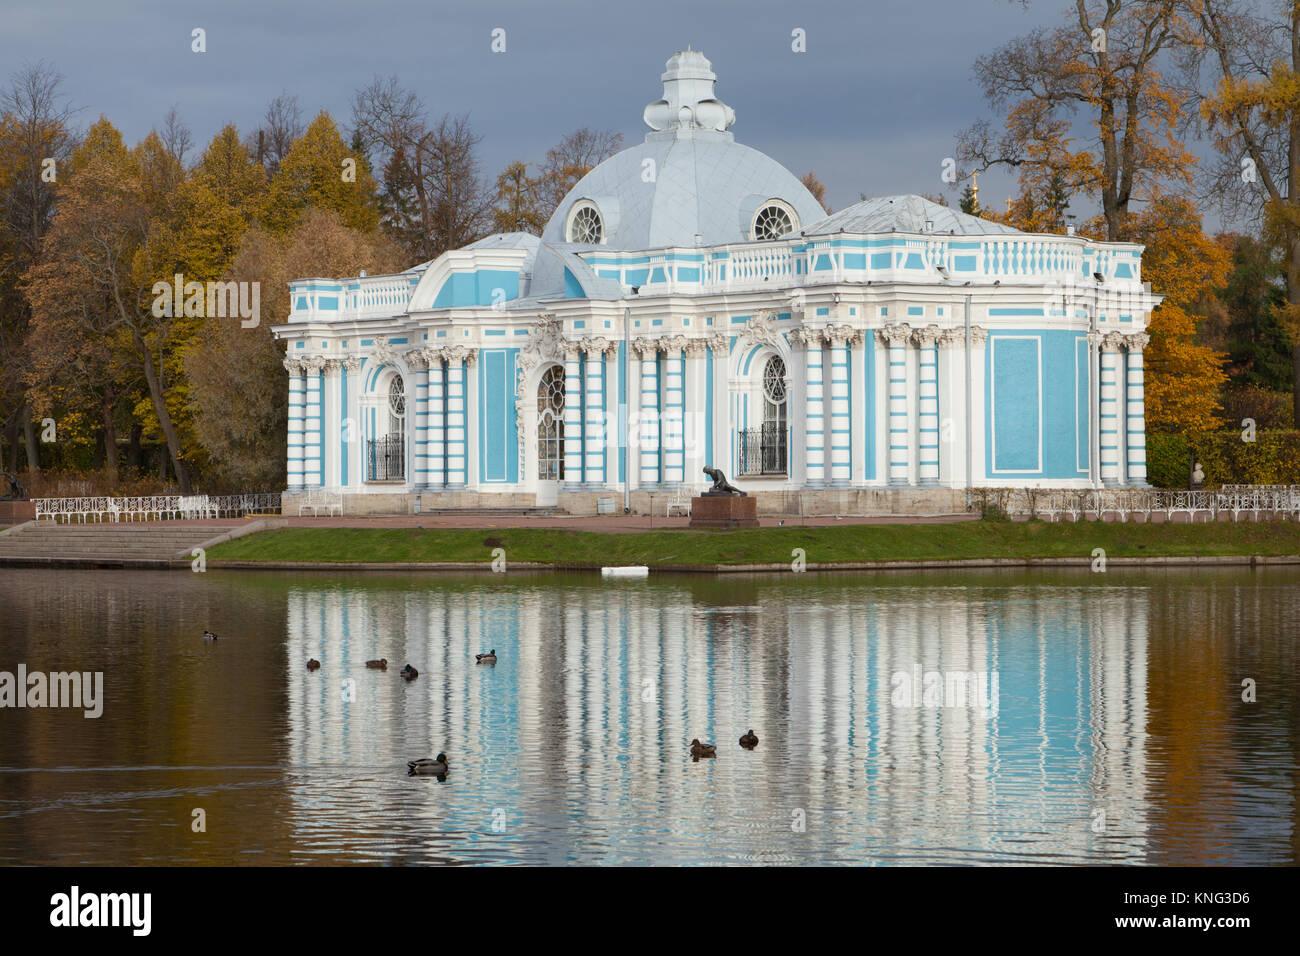 Grotto pavilion in Catherine park of Tsarskoe Selo, Saint Petersburg, Russia. - Stock Image